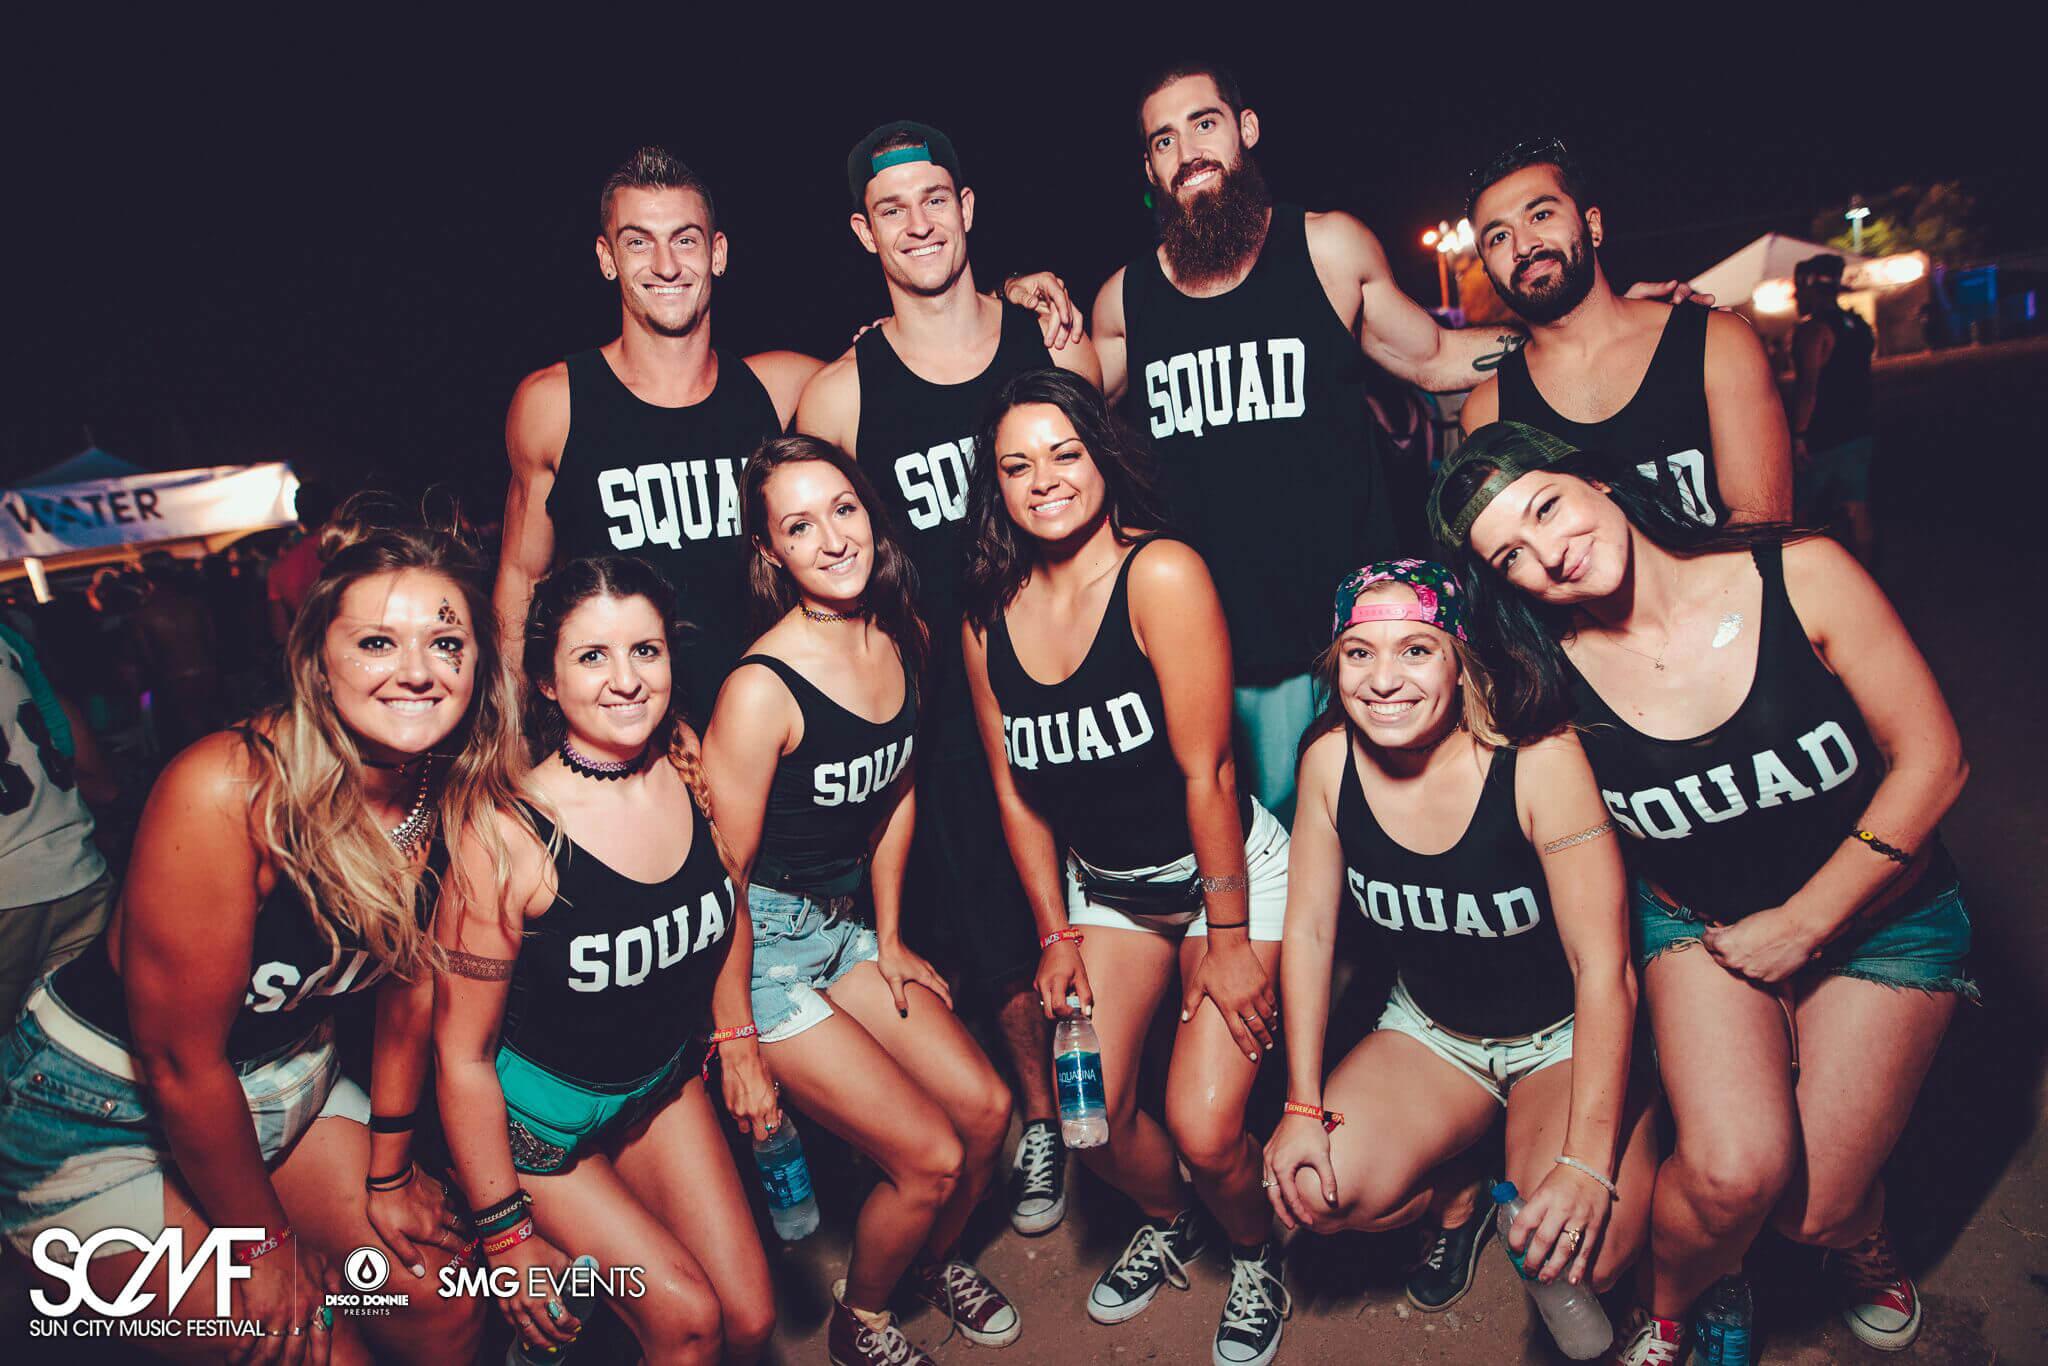 sun city squad